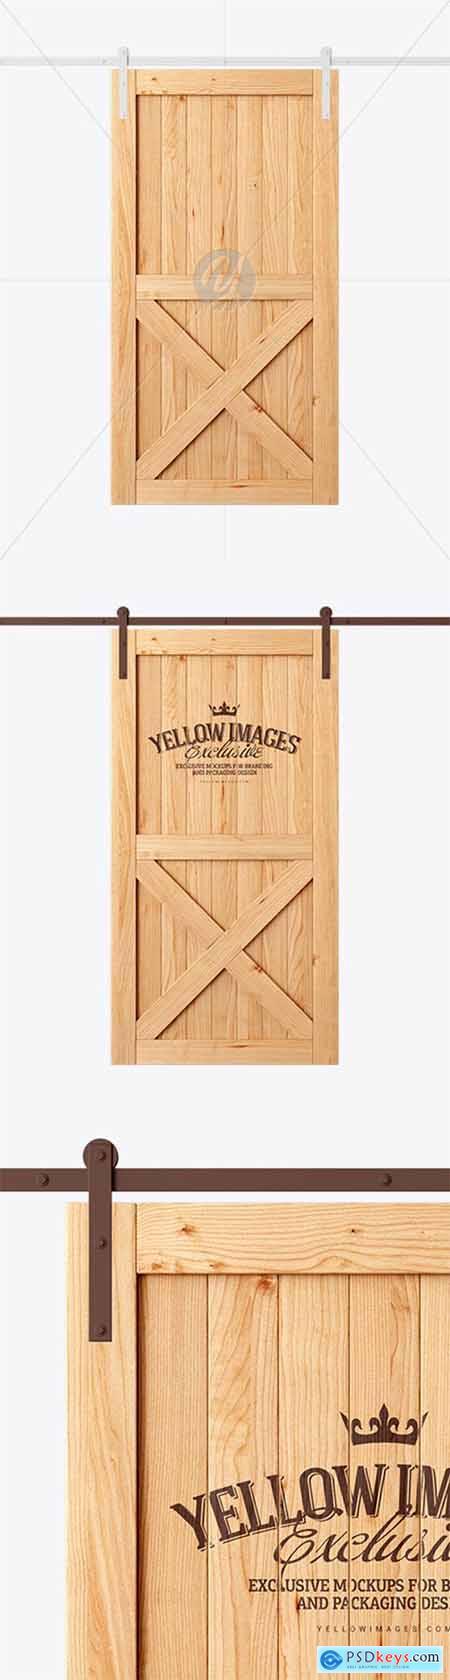 Vintage Wooden Barn Door Mockup 28613